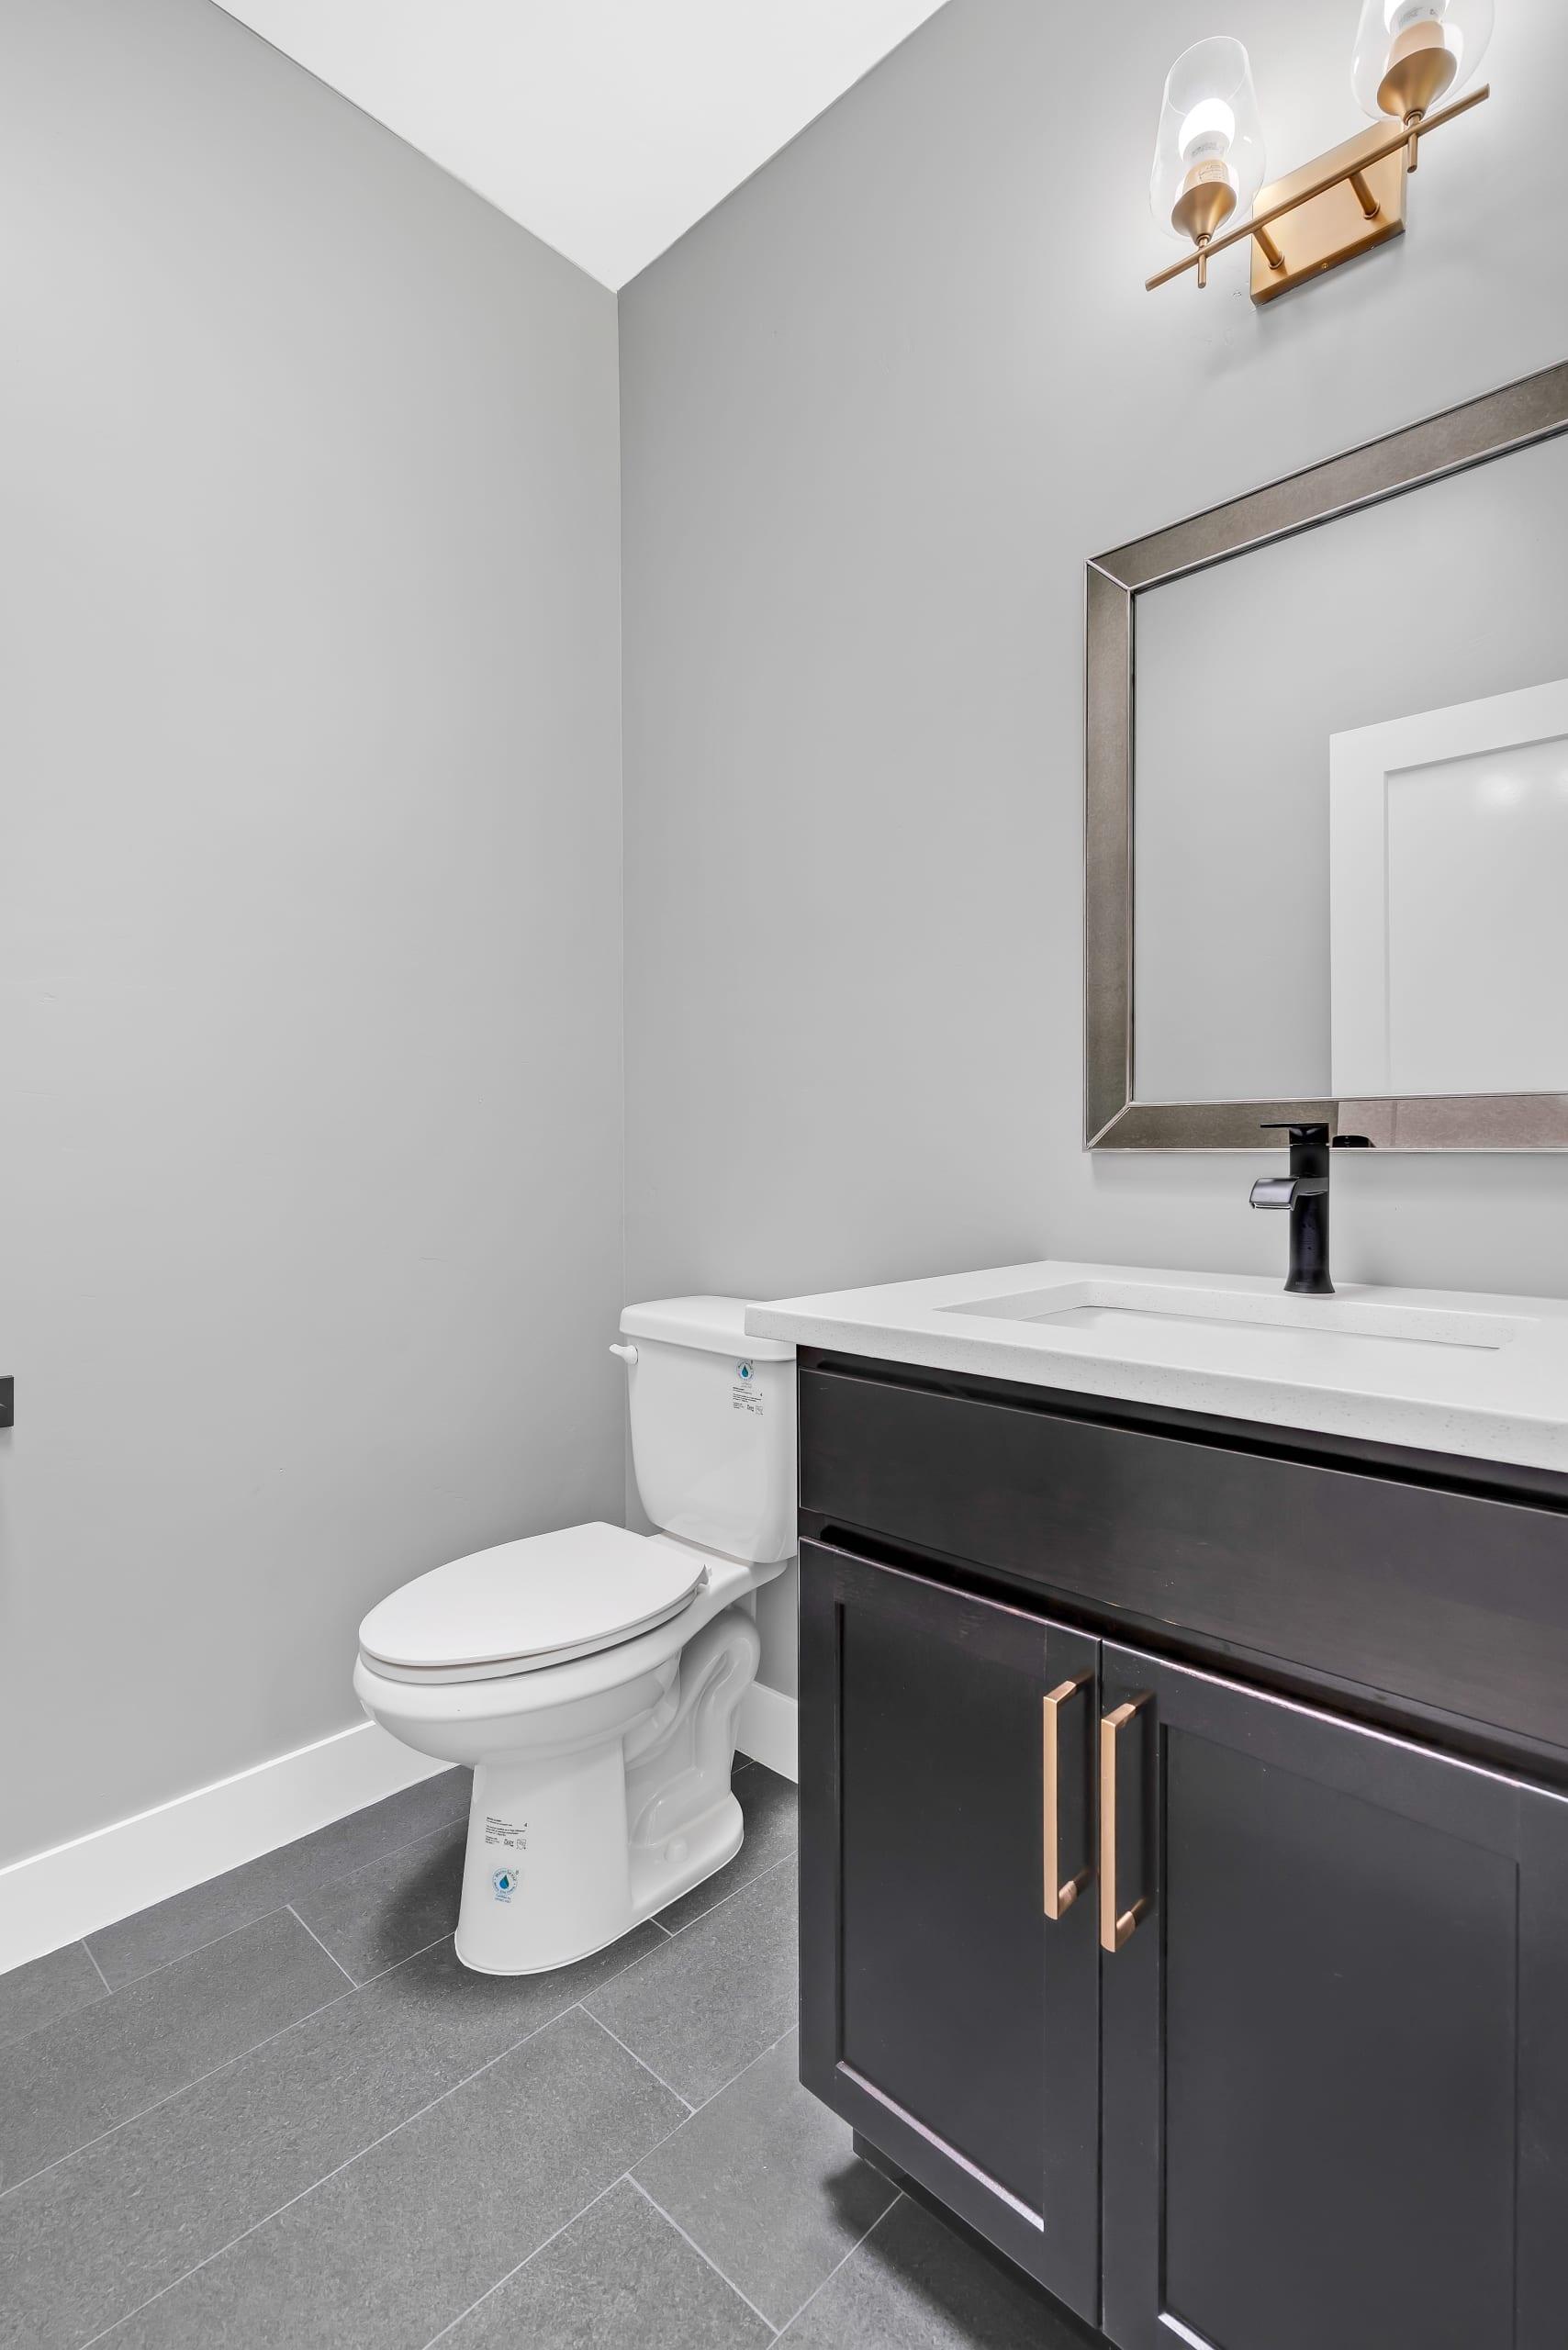 Bathroom - Single Sink - Toilet